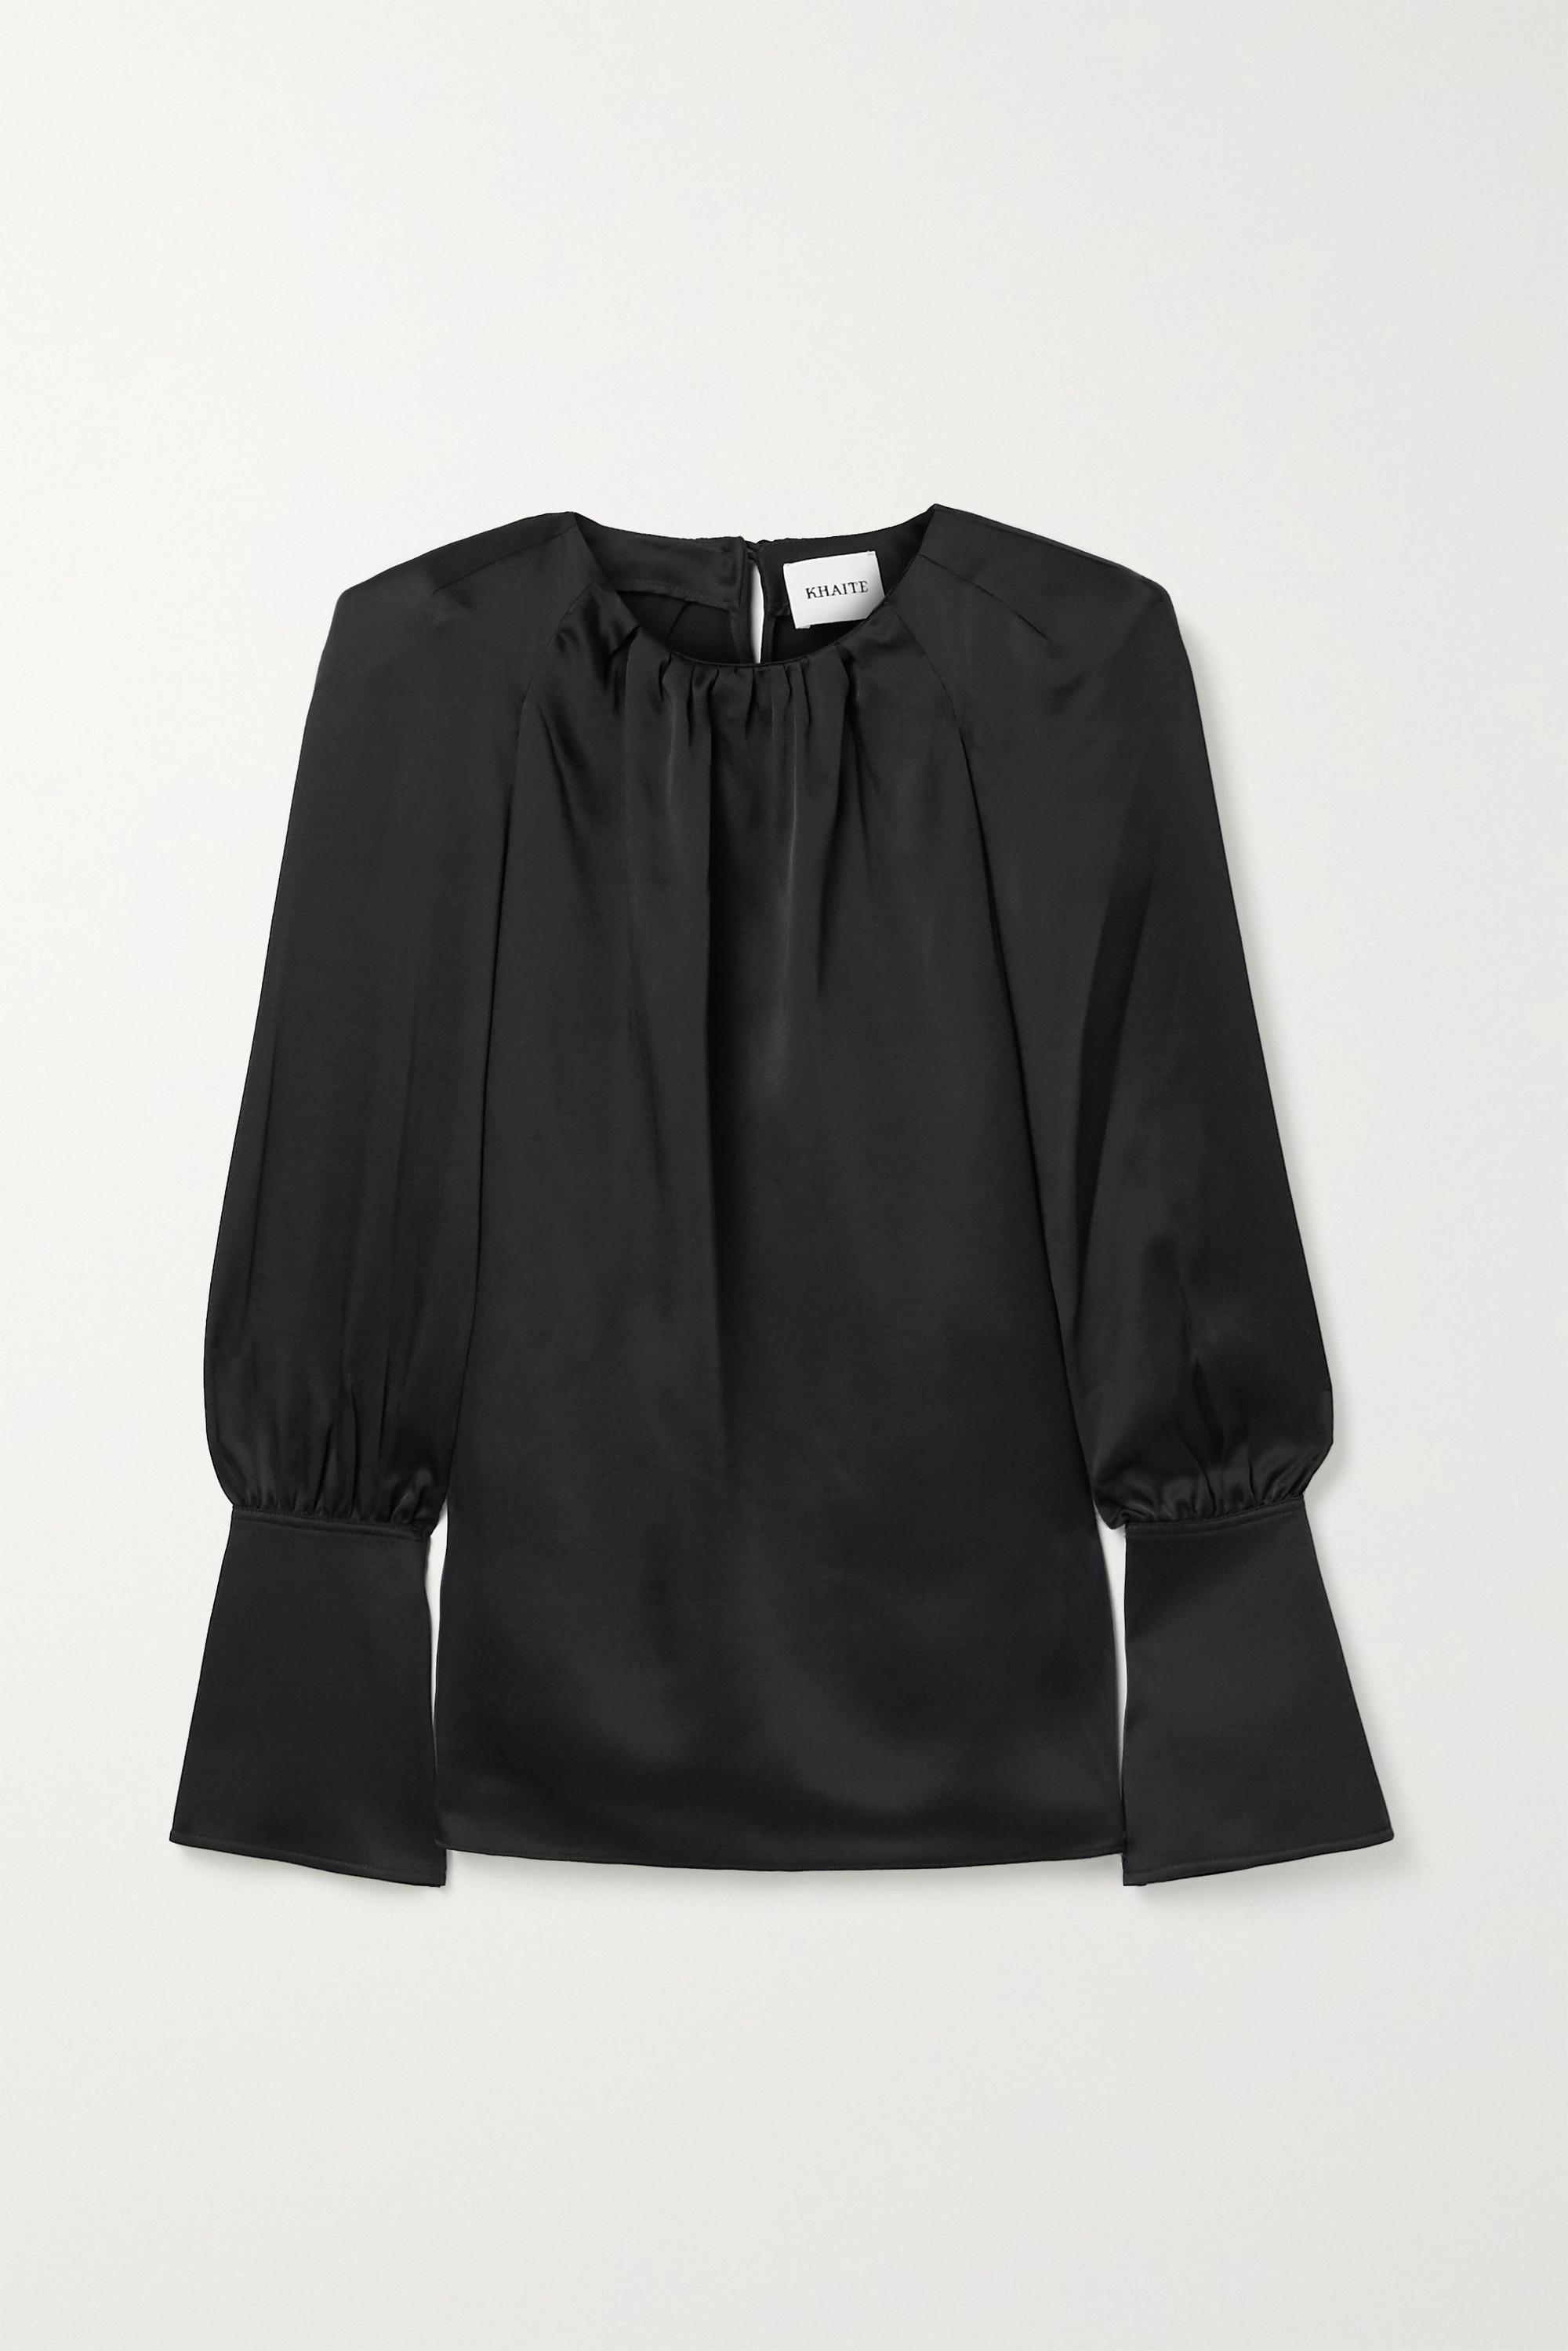 Khaite Kirsty cutout satin-crepe blouse